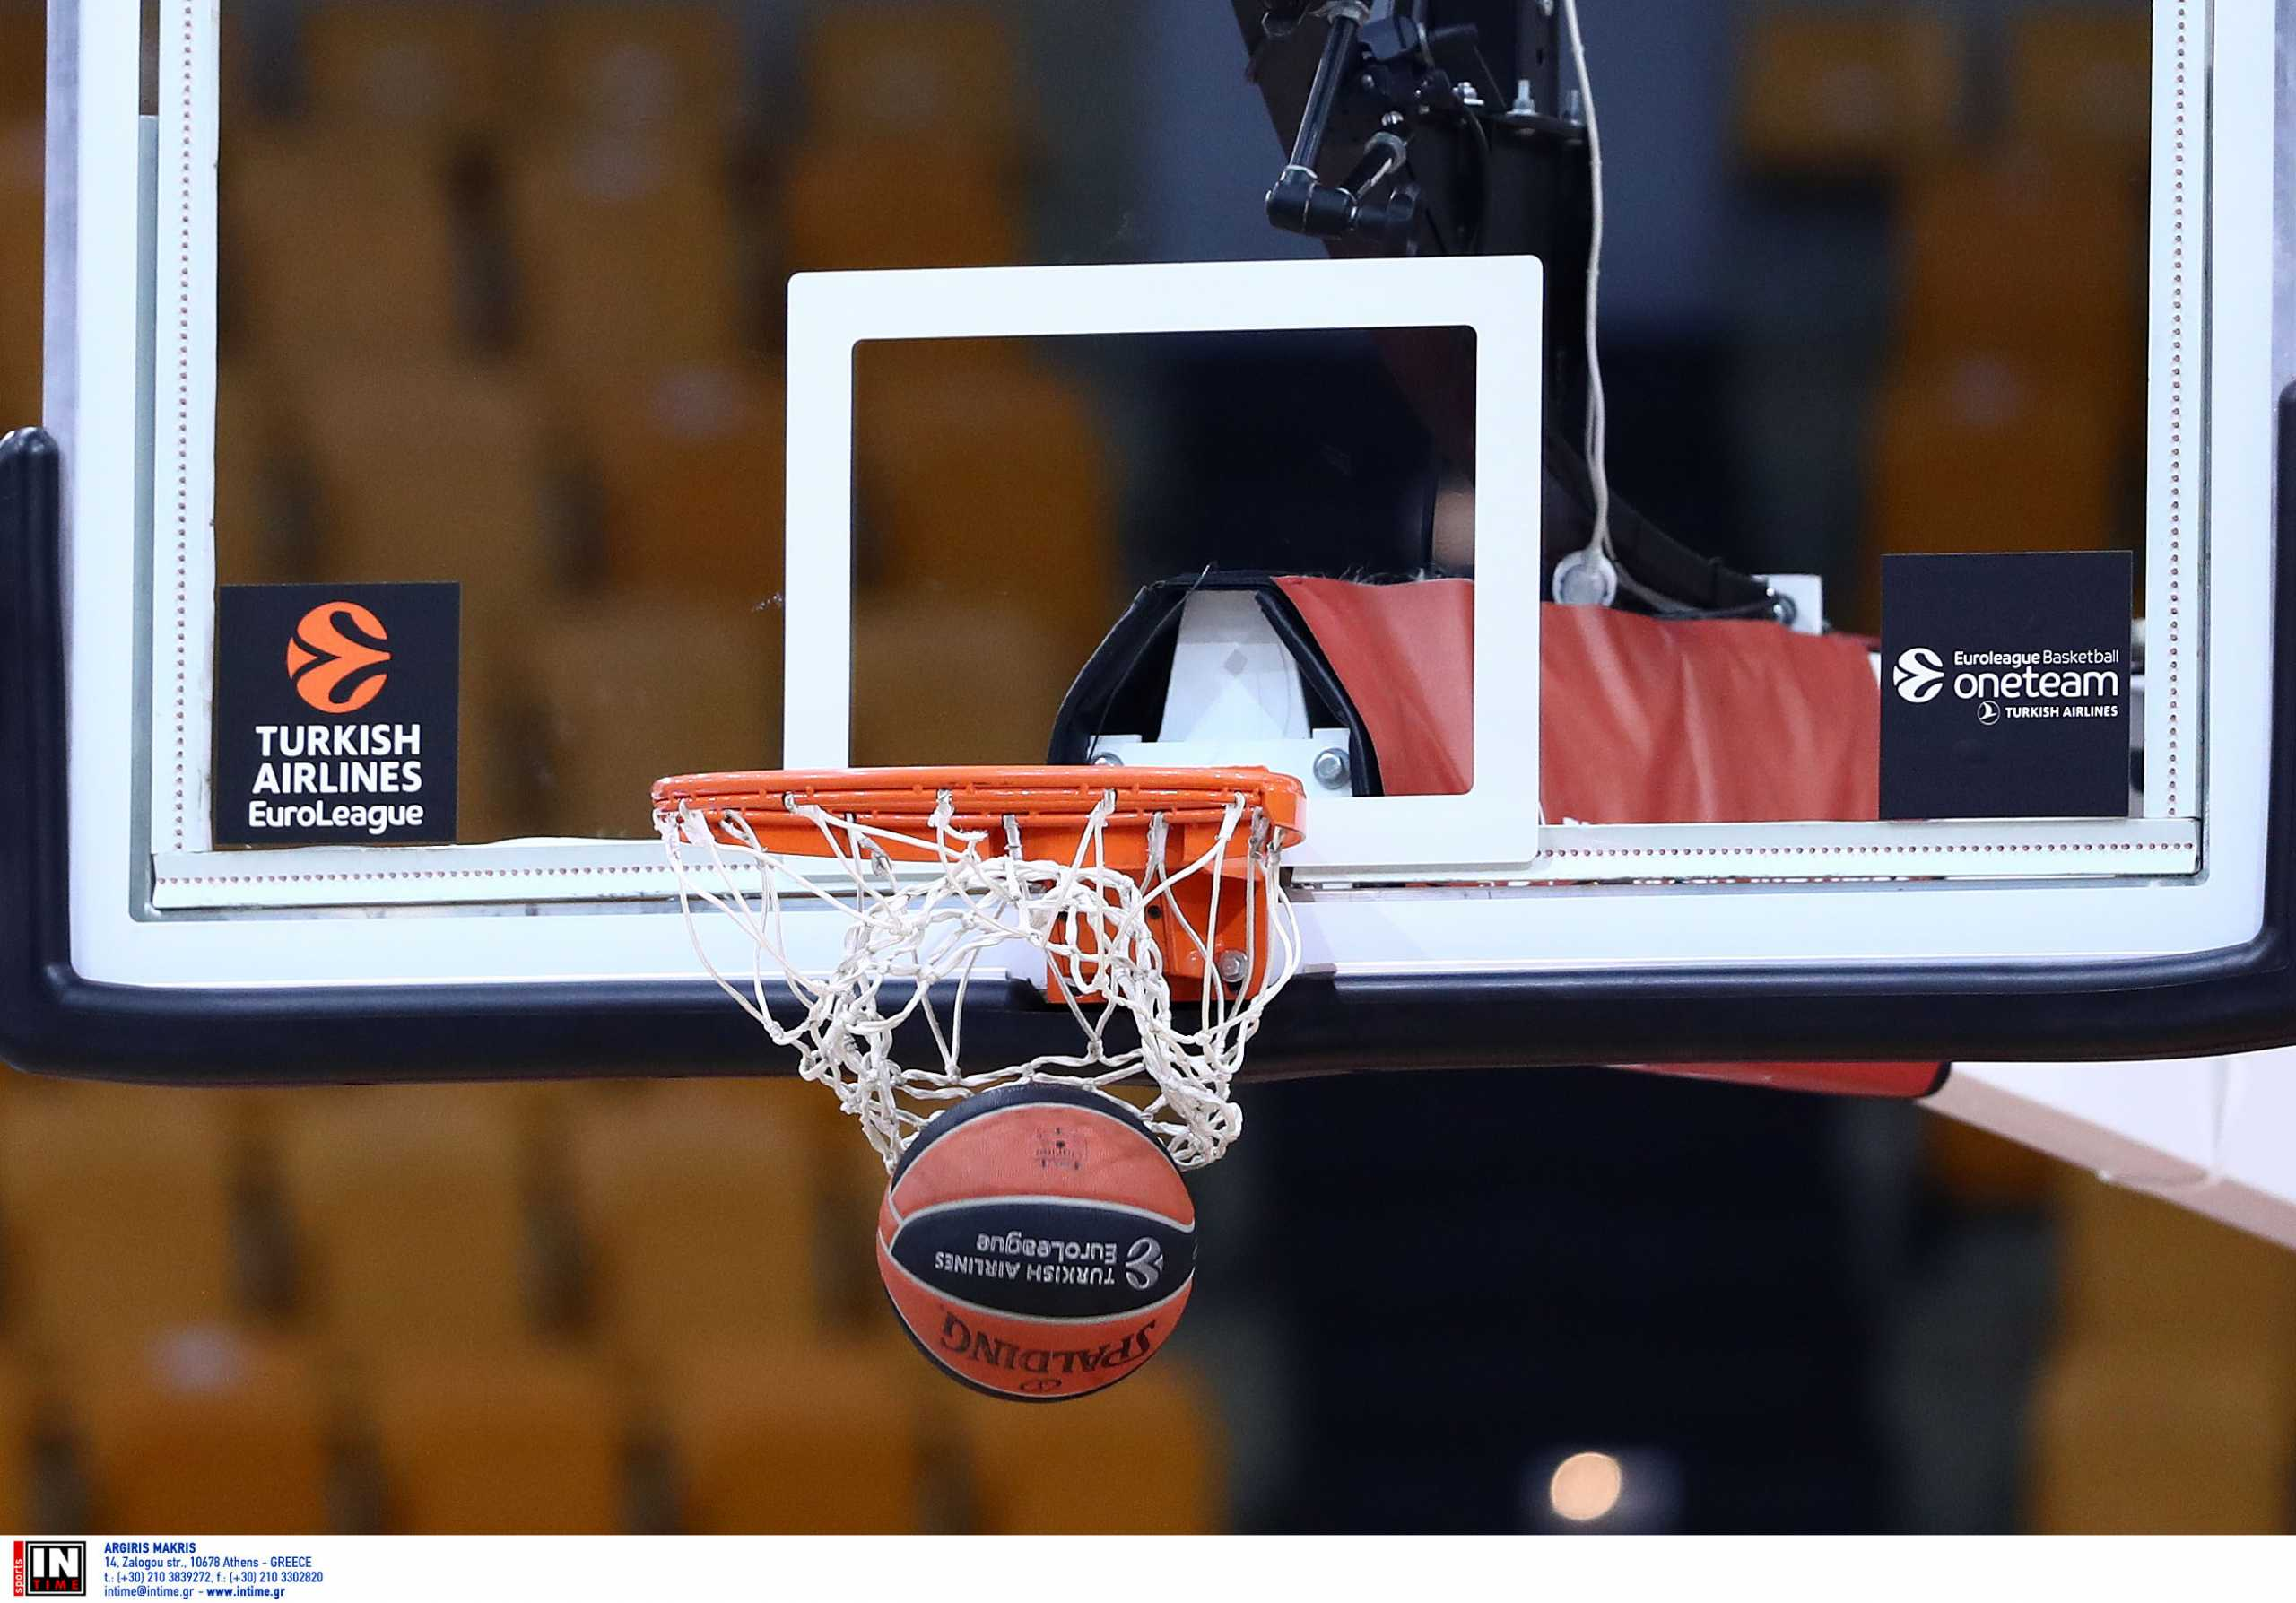 Euroleague: Πάρτι με φόντο το Final-4 και καλεσμένη τη Μπάγερν έστησε η Αρμάνι